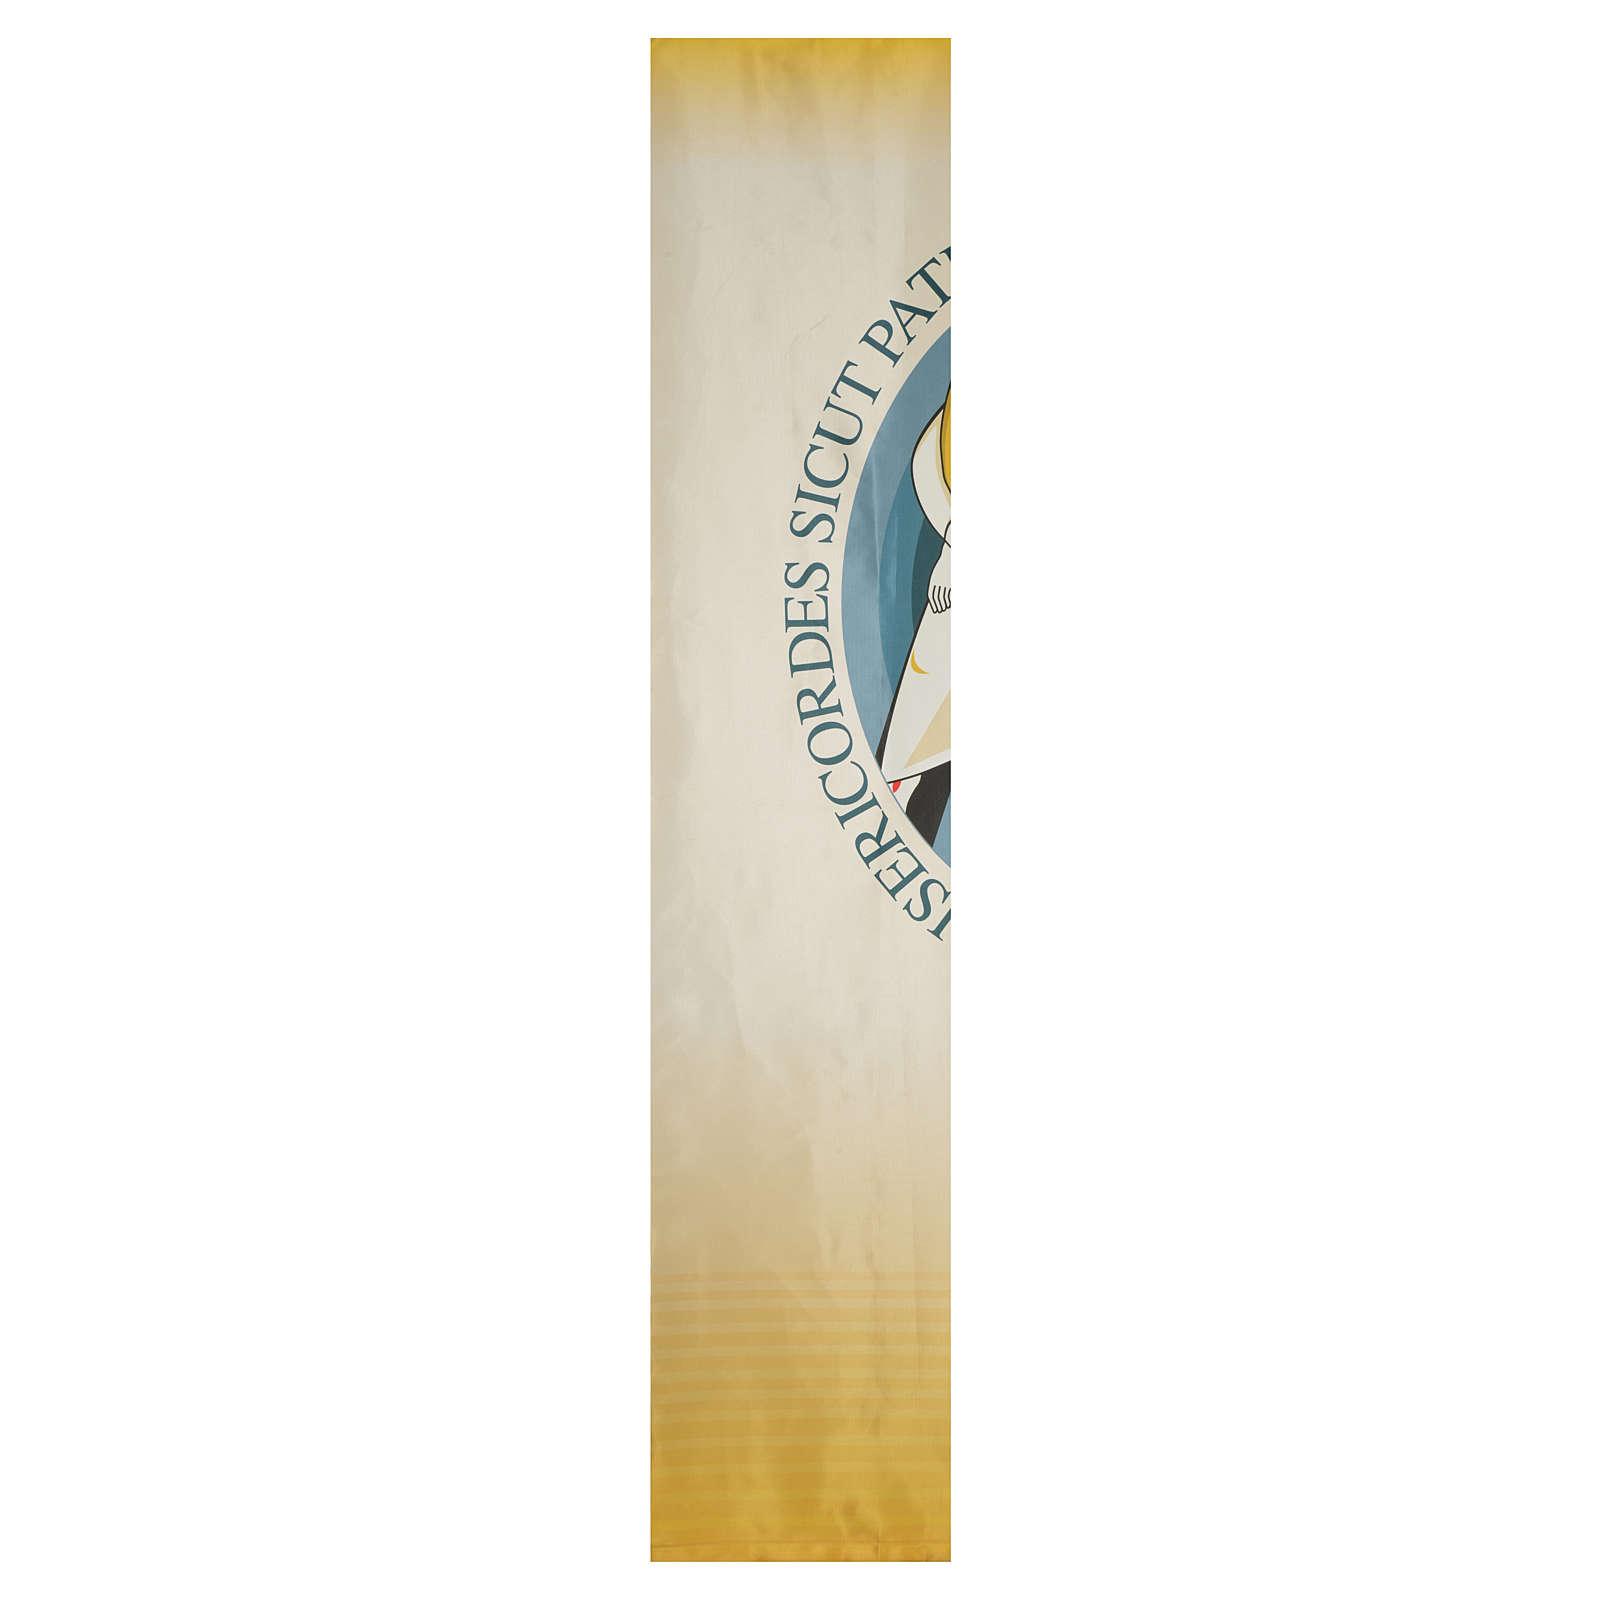 STOCK Símbolo Jubileu Misericórdia LATIM tecido 130x300 cm impressão 3